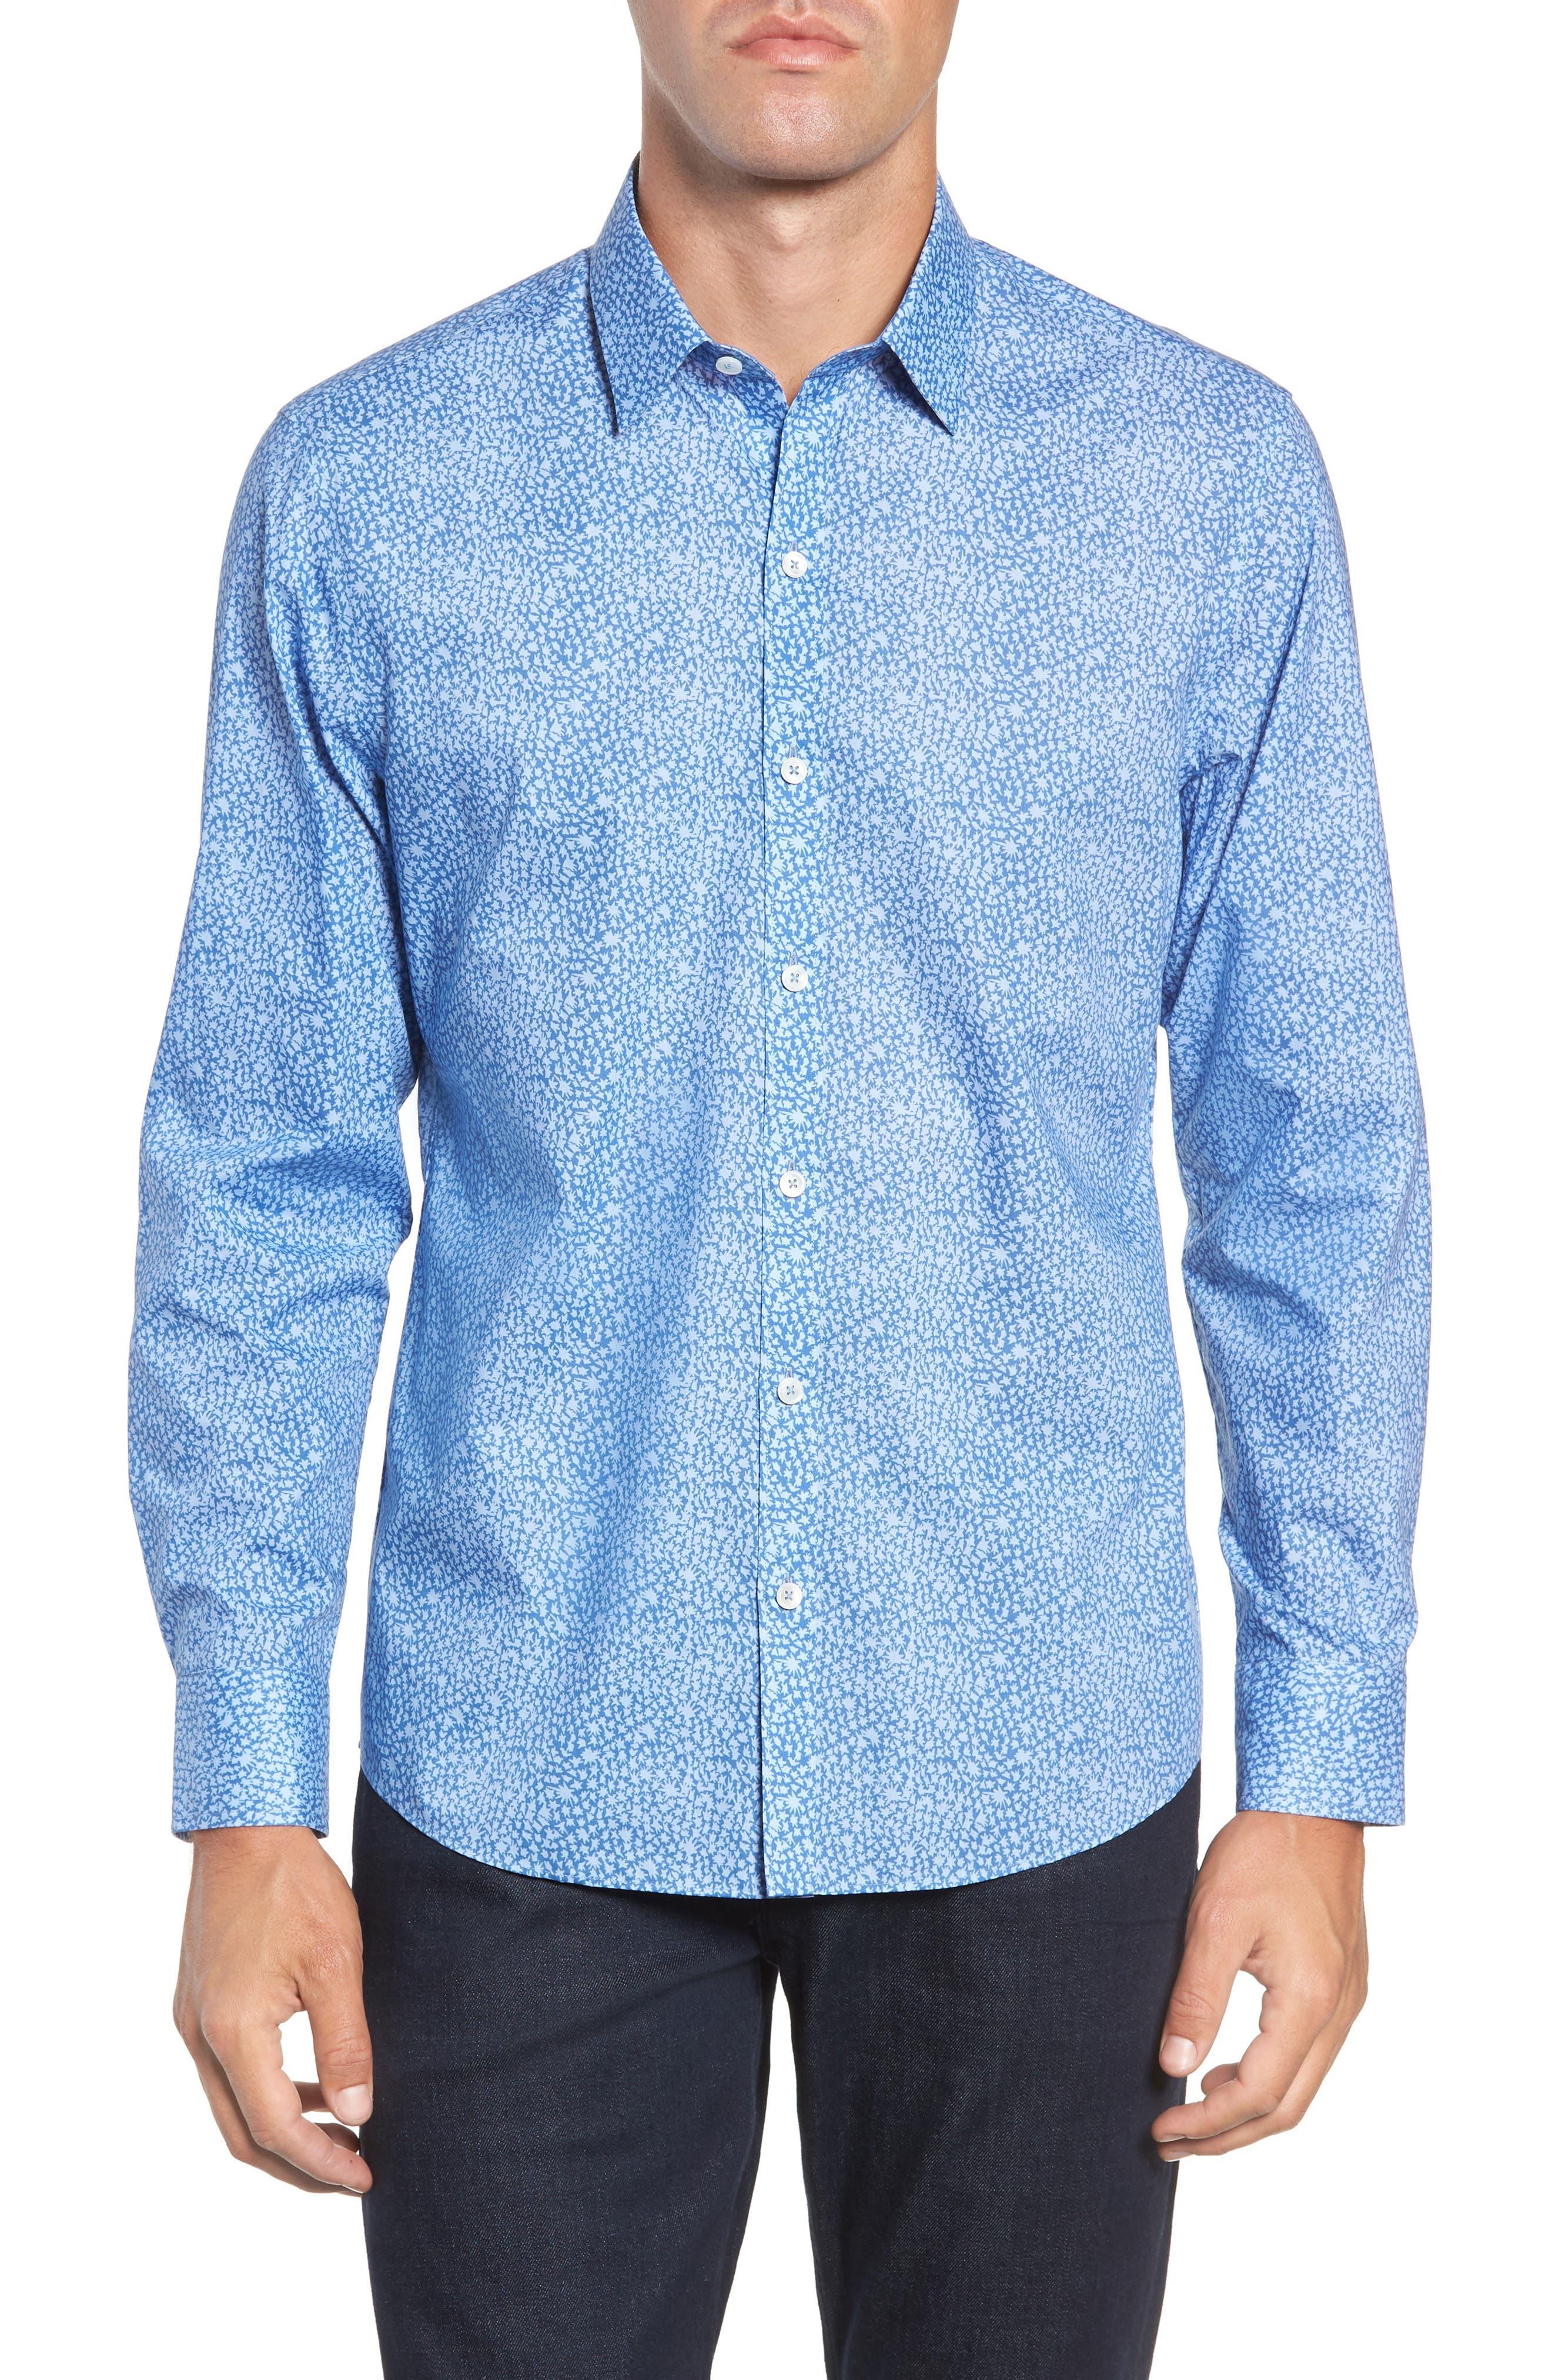 ZACHARY PRELL, Elliot Regular Fit Sport Shirt, Main thumbnail 1, color, 422